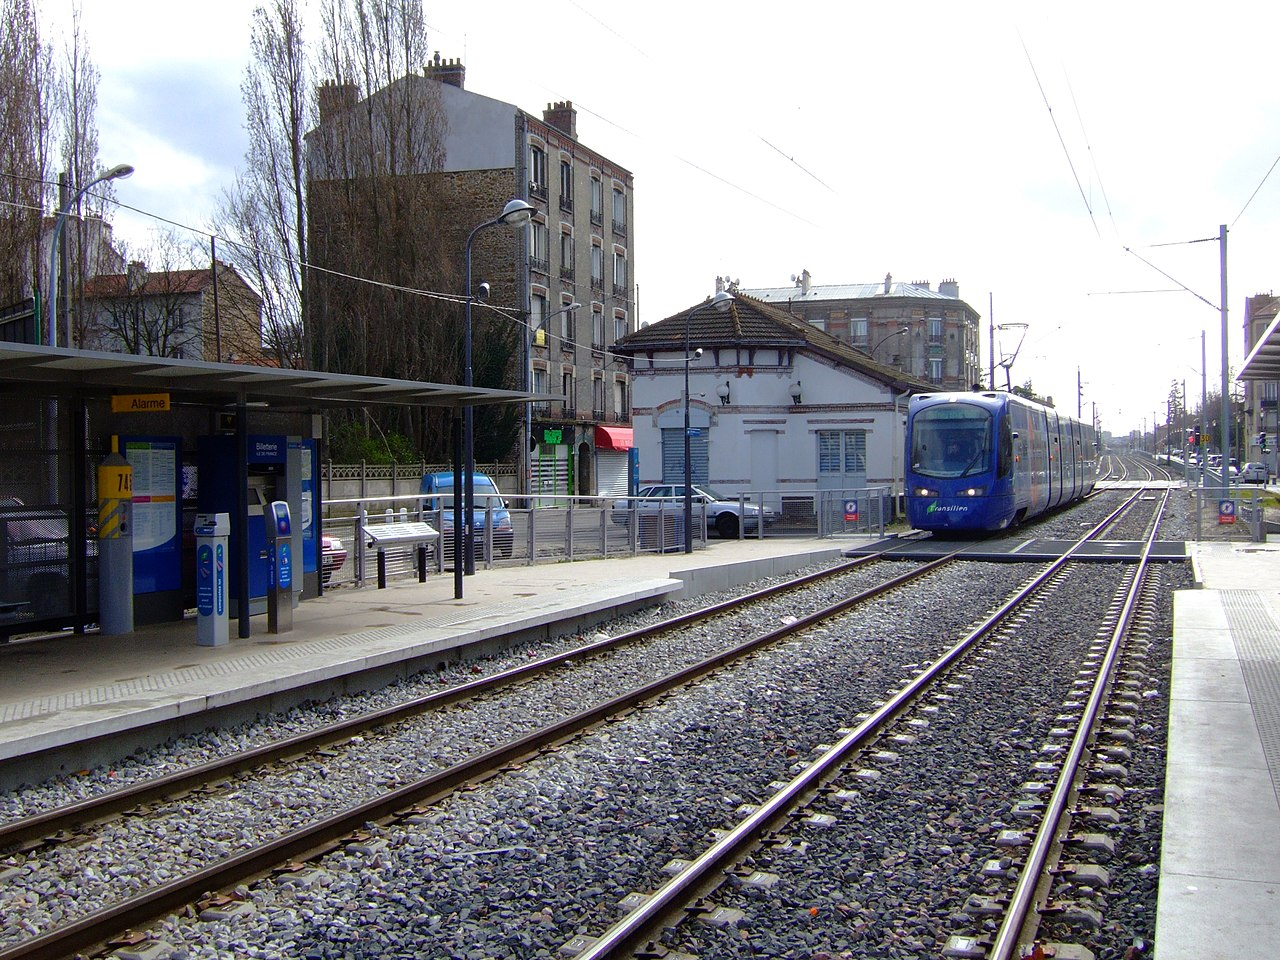 File Tram station, Les Pavillons sous Bois fr 01 jpg Wikimedia Commons # Mairie Les Pavillons Sous Bois